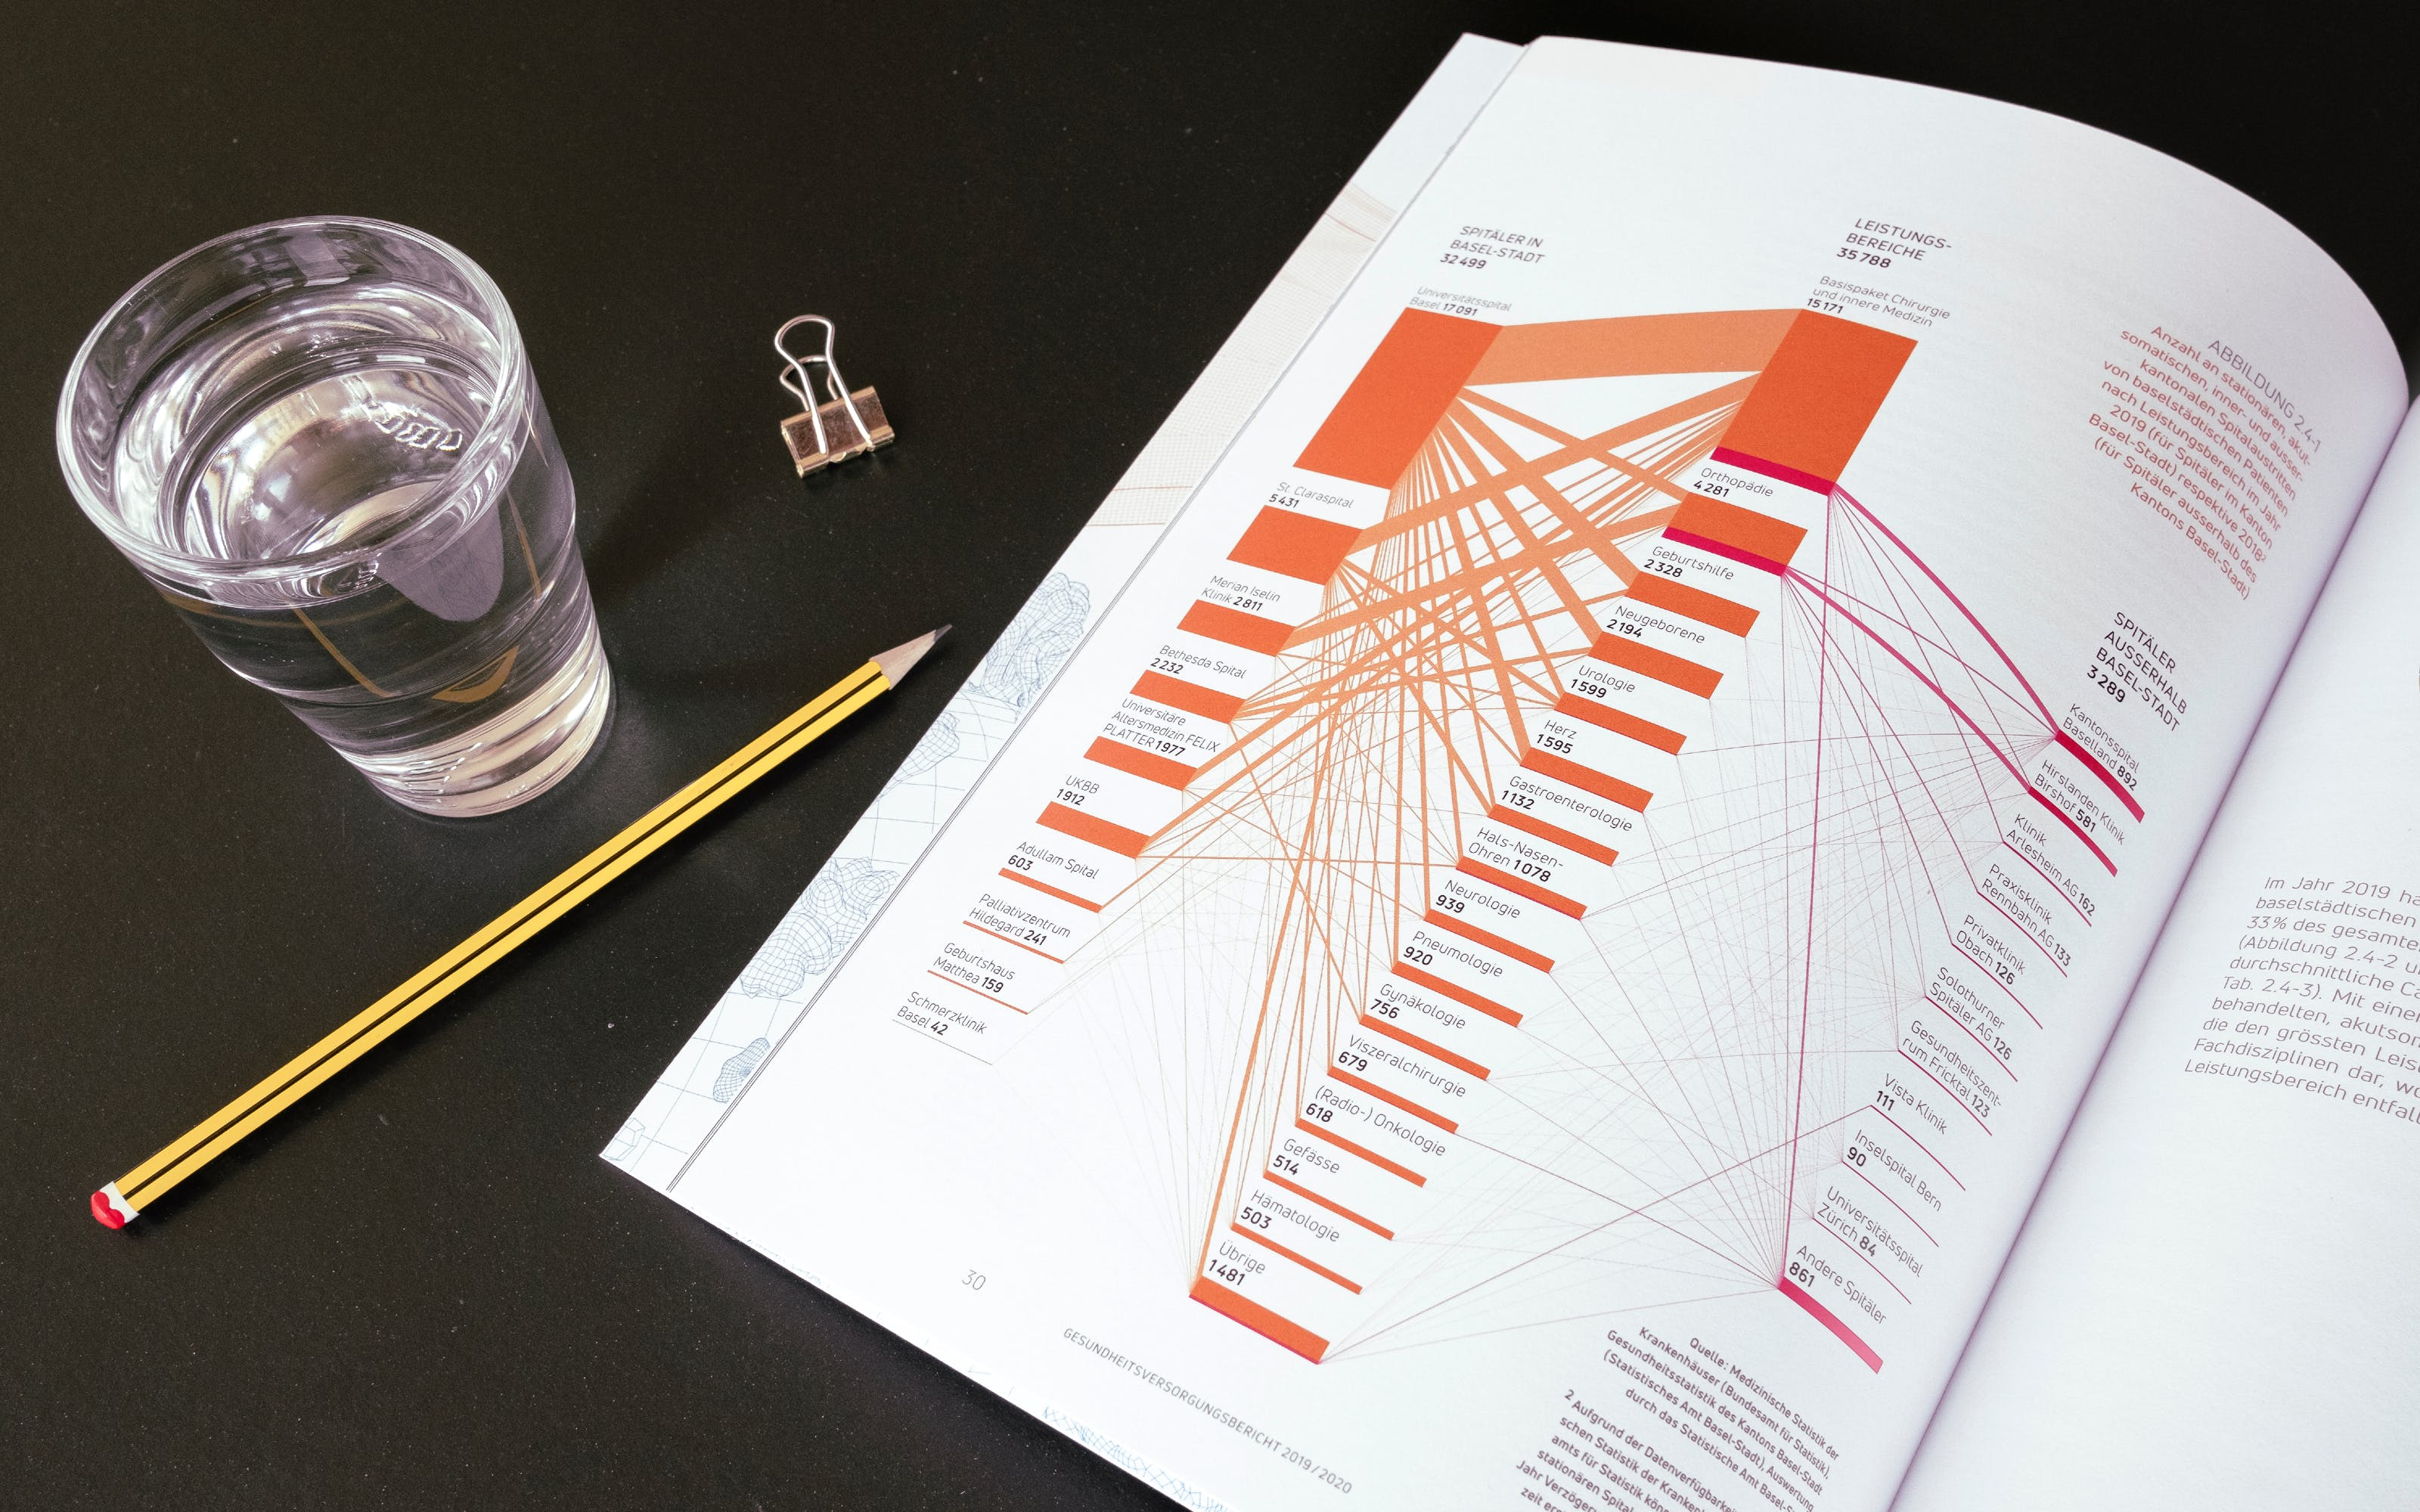 superdot studio healthcare annual report alluvial diagram data viz visualization